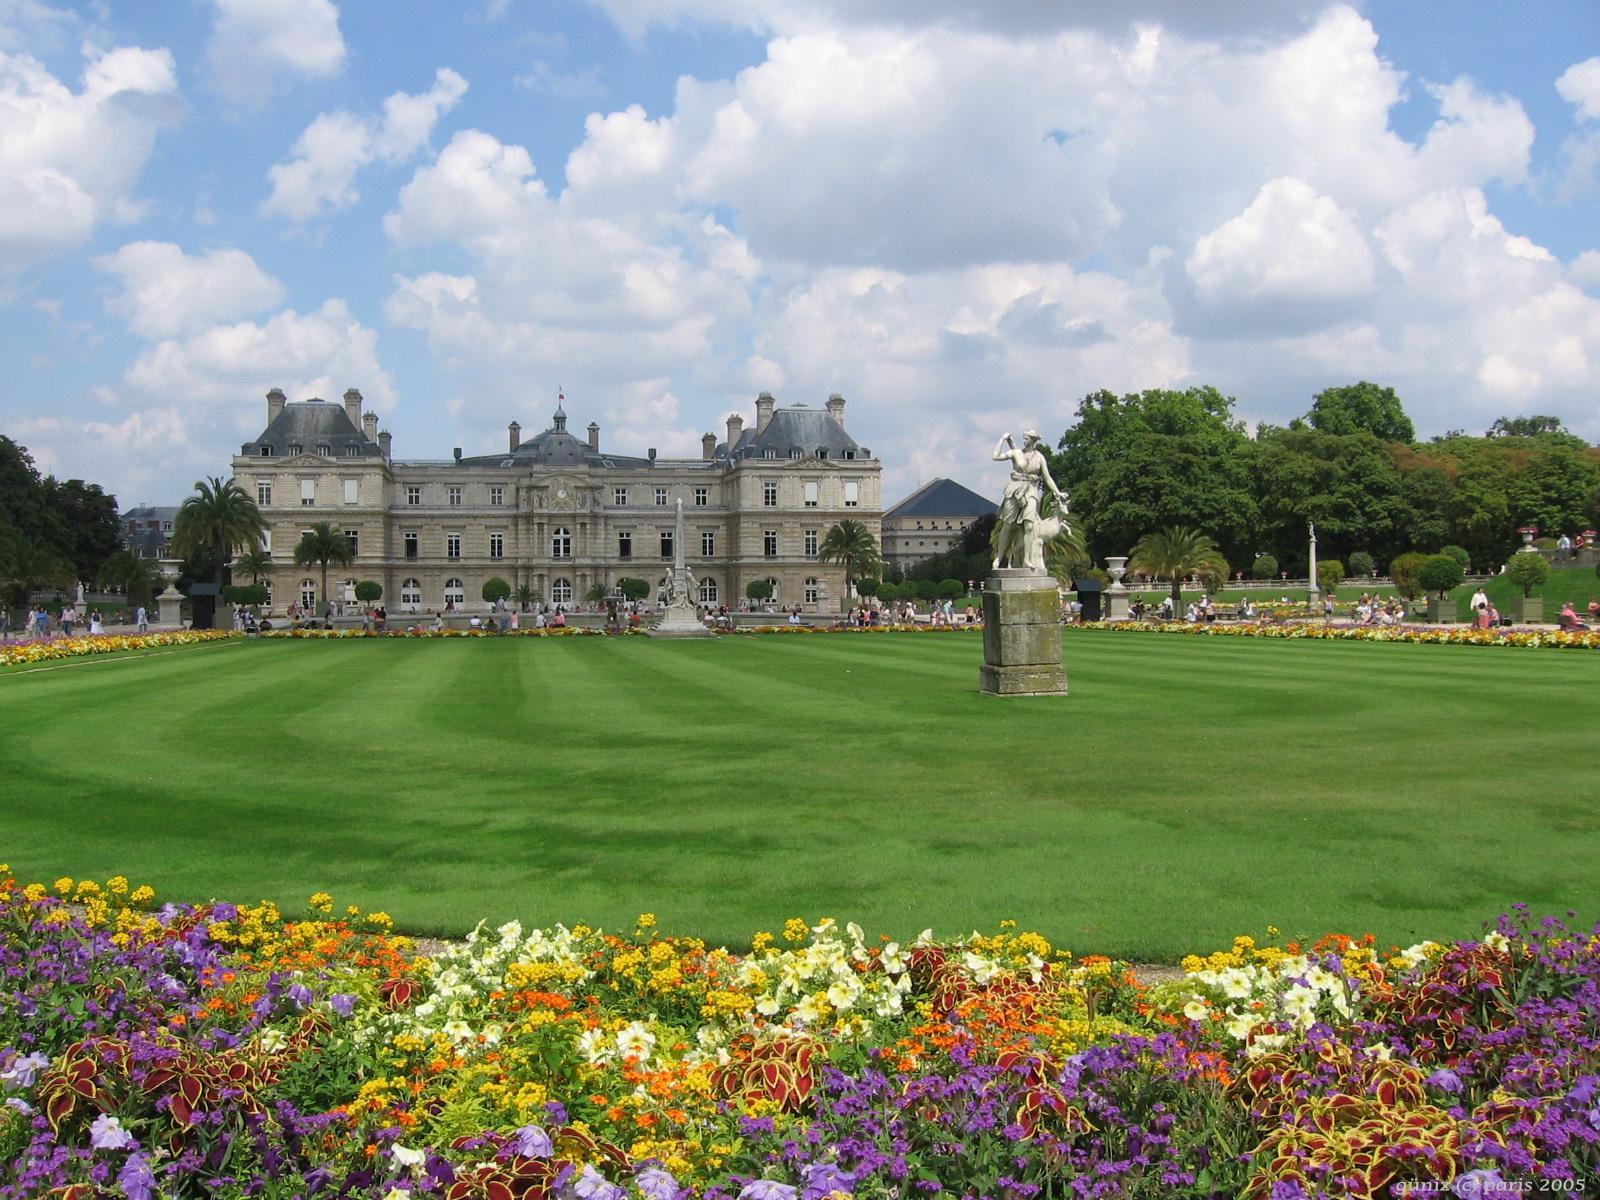 Jardin du luxemburg paris by ancelique on deviantart for Art du jardin zbinden sa